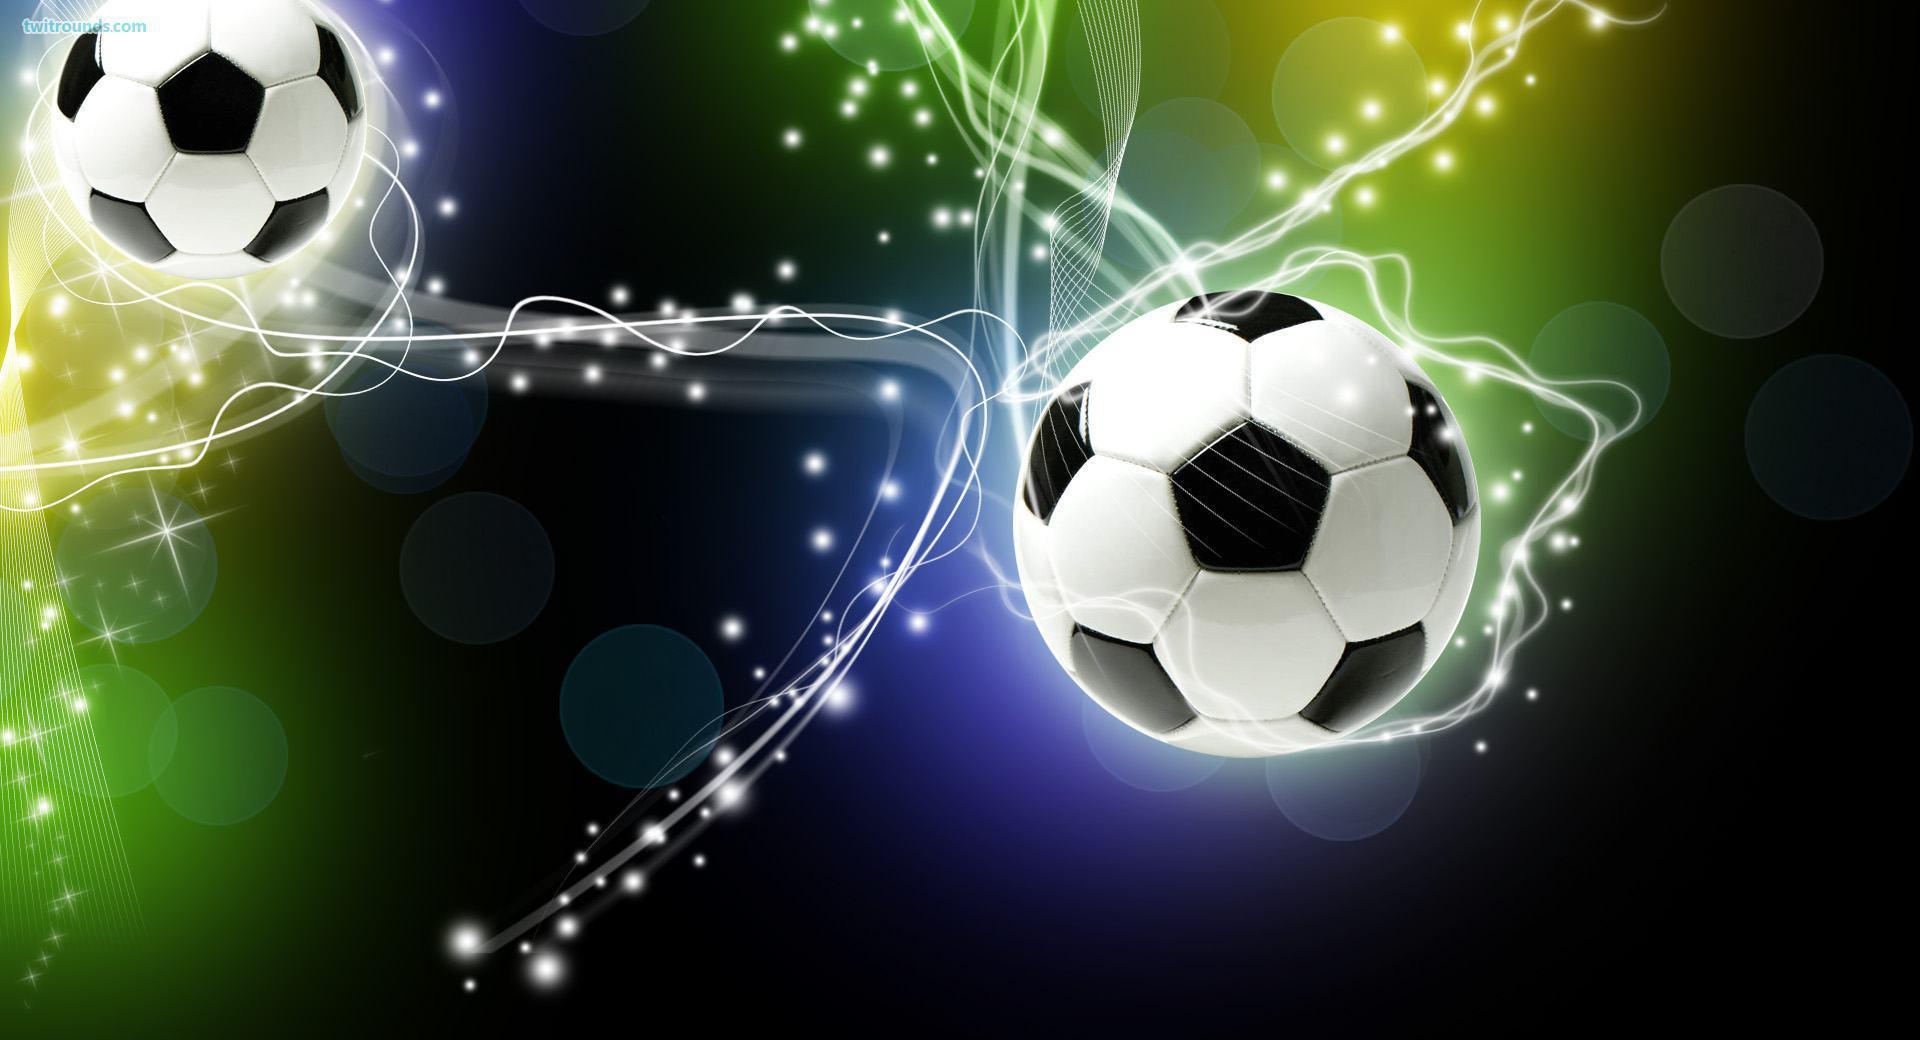 Soccer Desktop Backgrounds 1920x1040